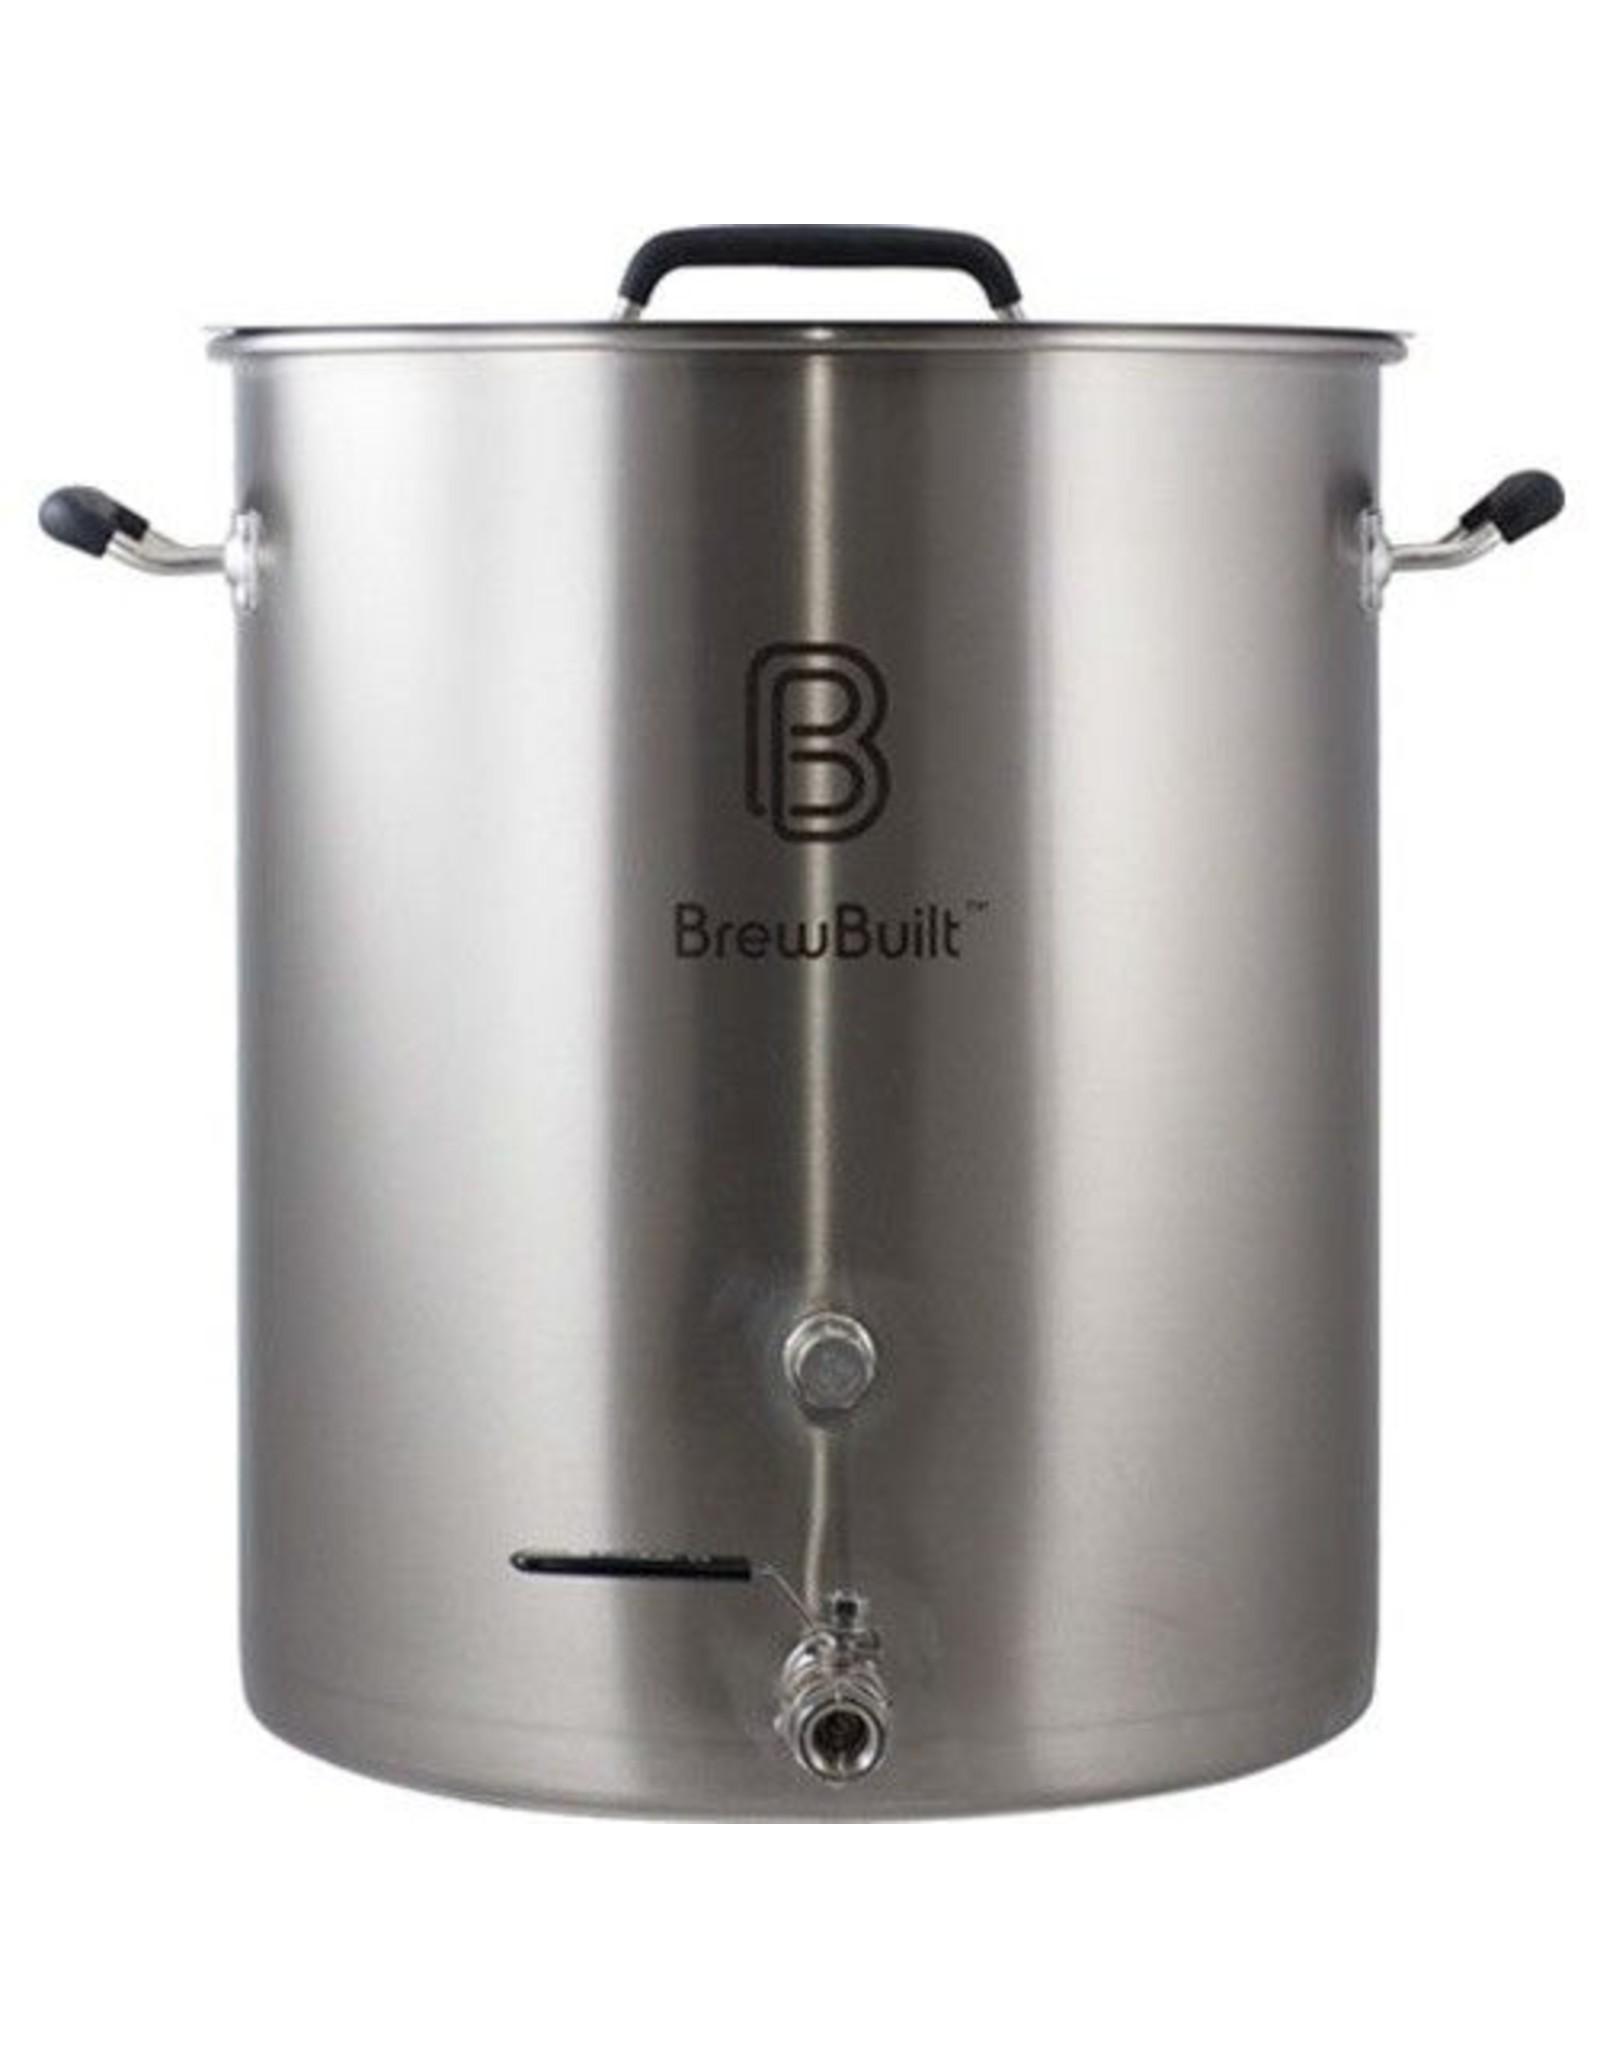 BrewBuilt 10 Gallon Brewing Kettle